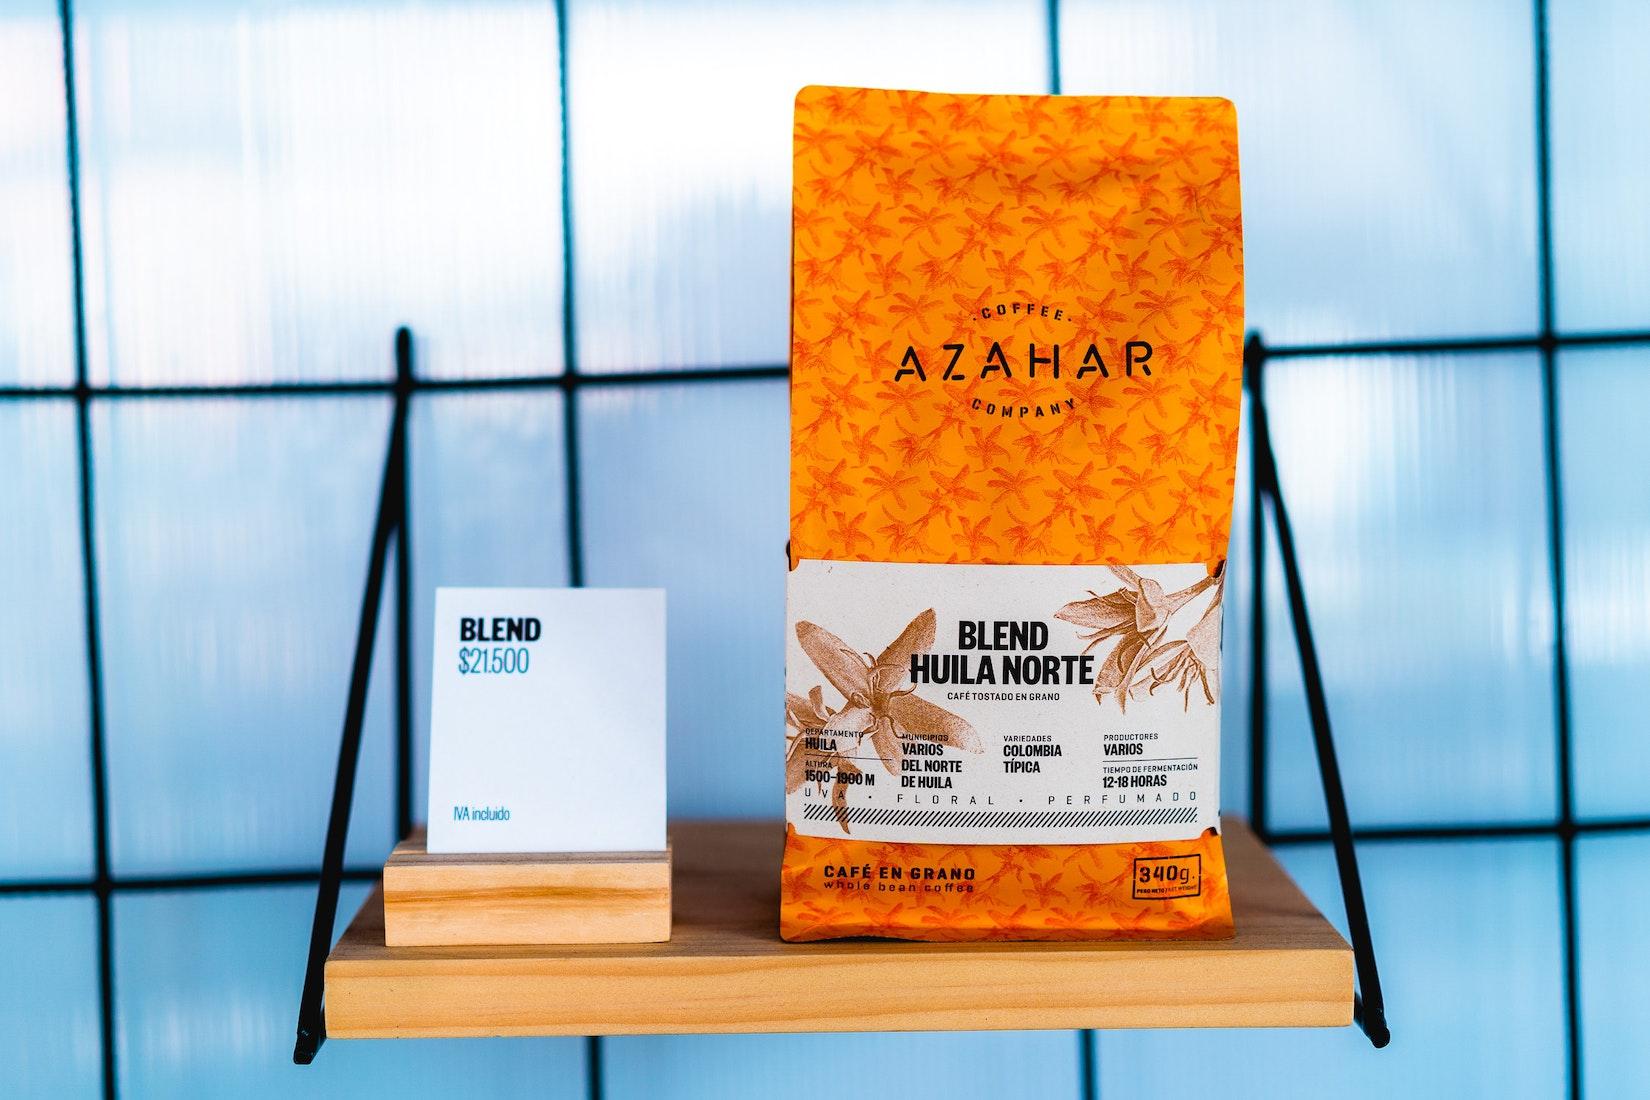 Azahar packaged coffee on a shelf